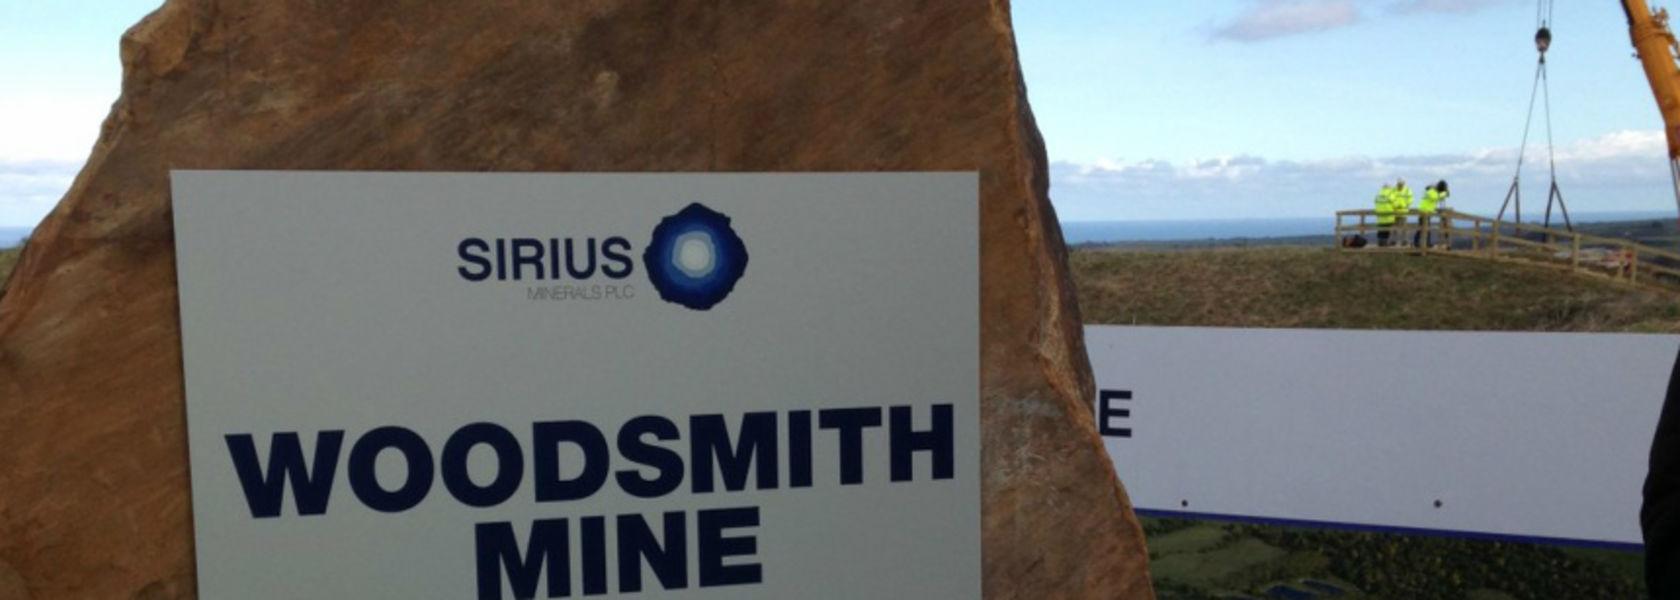 Sirius ups Woodsmith capex by $500M - Mining Journal